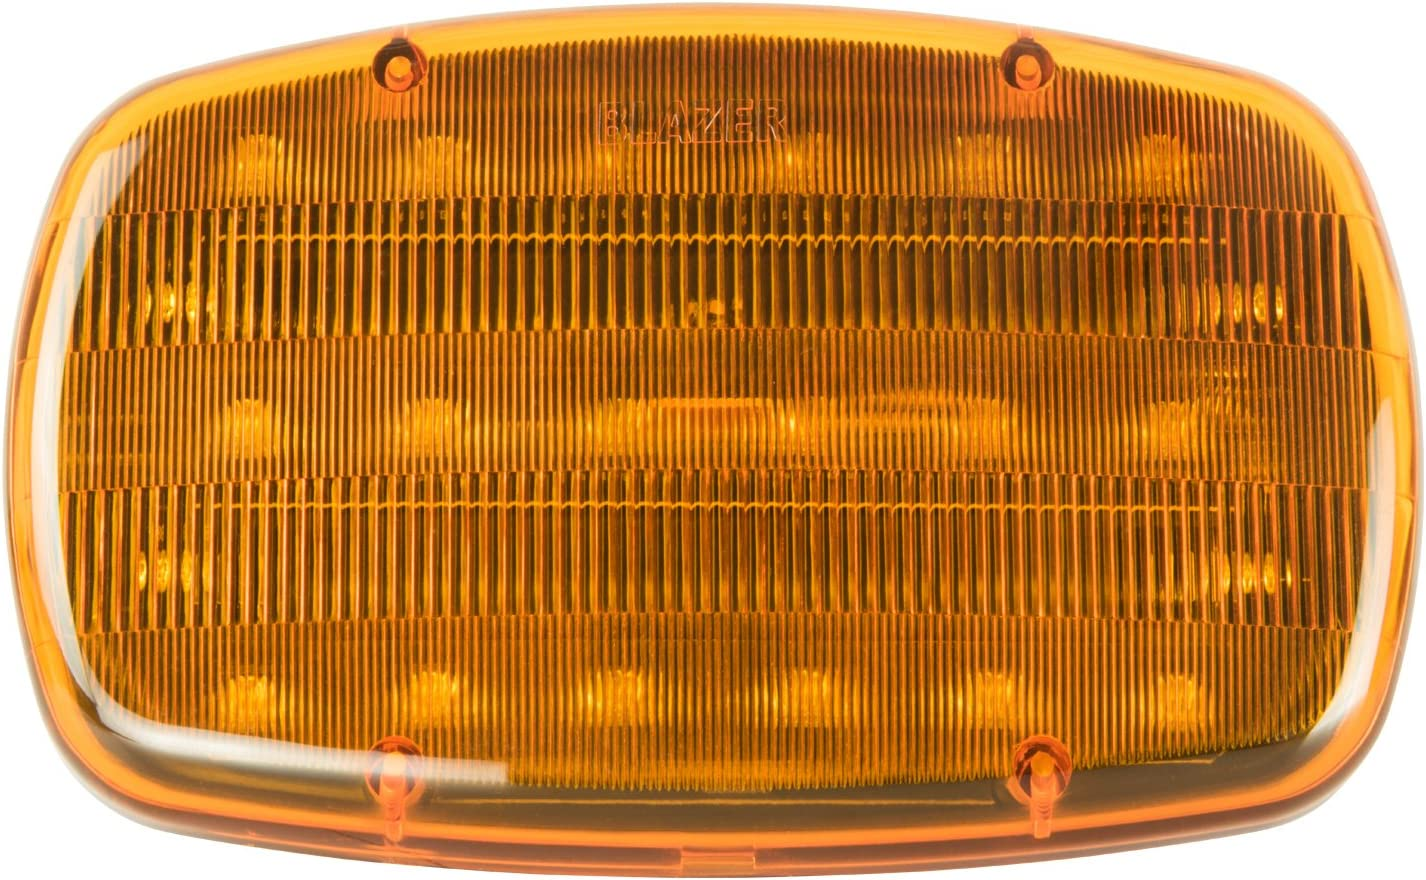 Blazer C6350A LED Magnetic Emergency Light, Amber